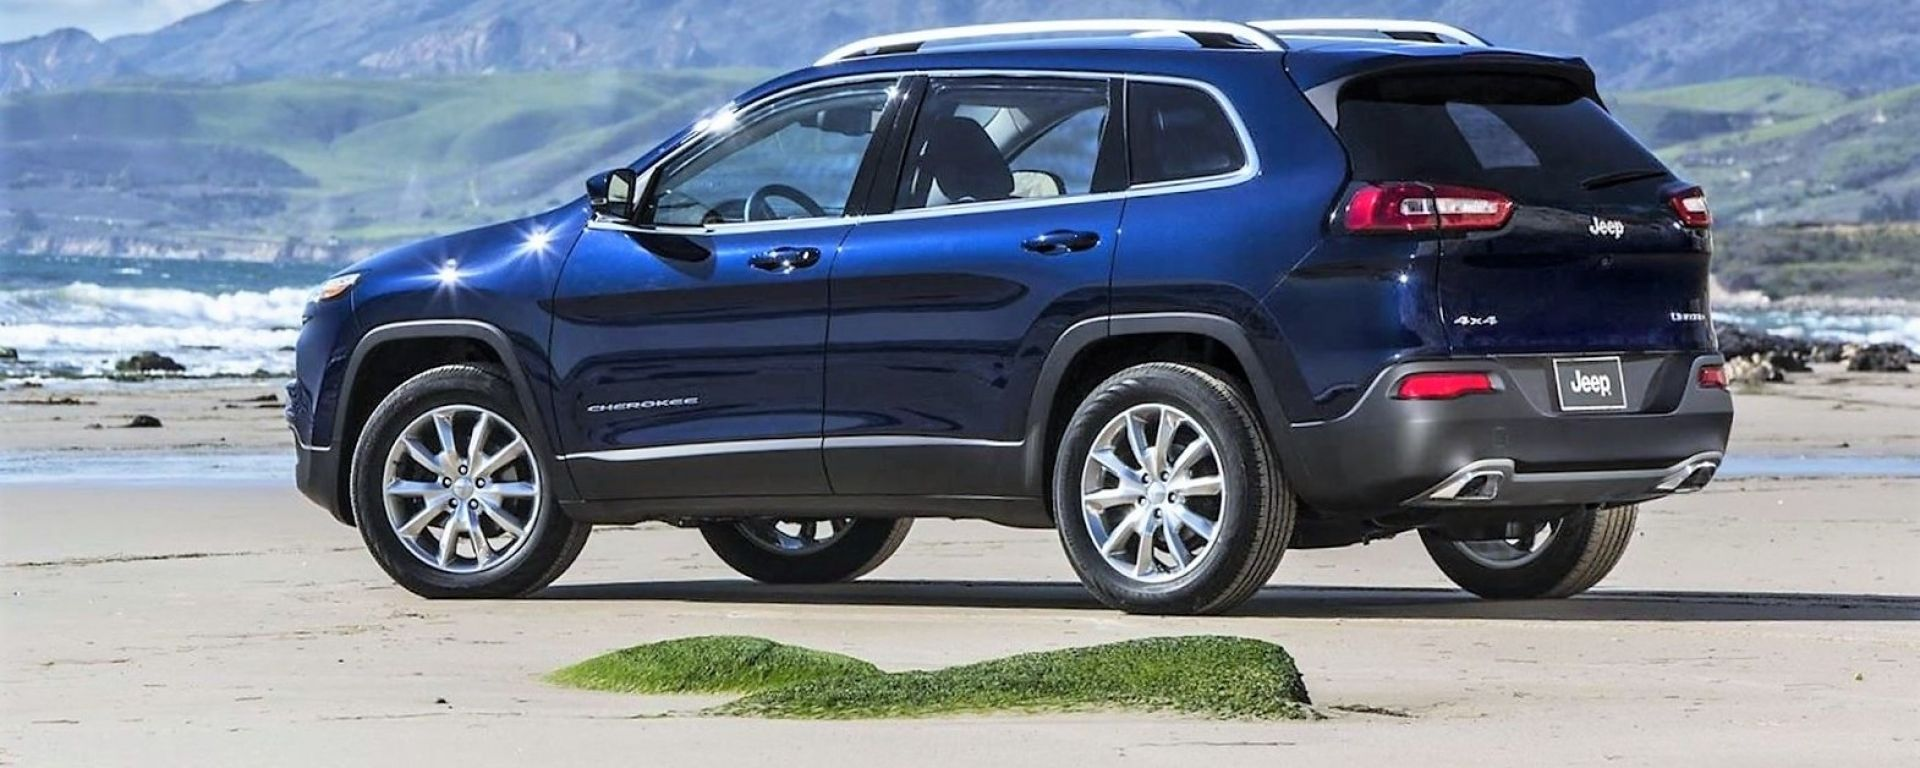 Jeep Cherokee 2018: vista laterale